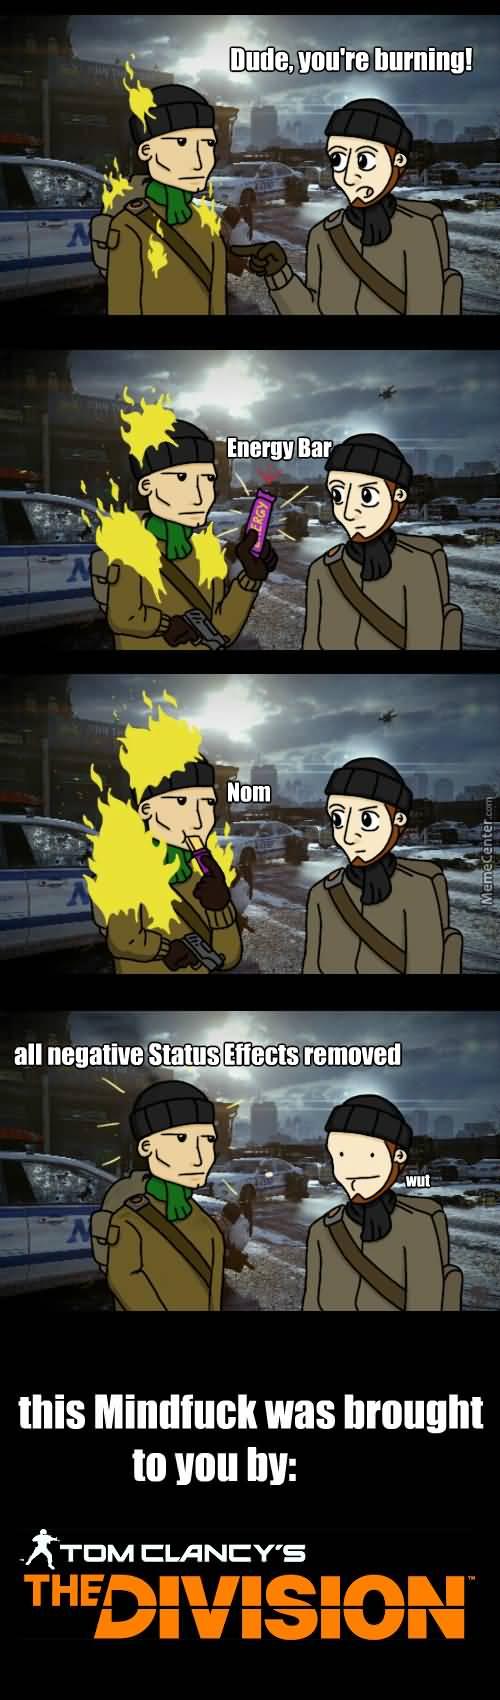 The Division Meme Joke Image 03